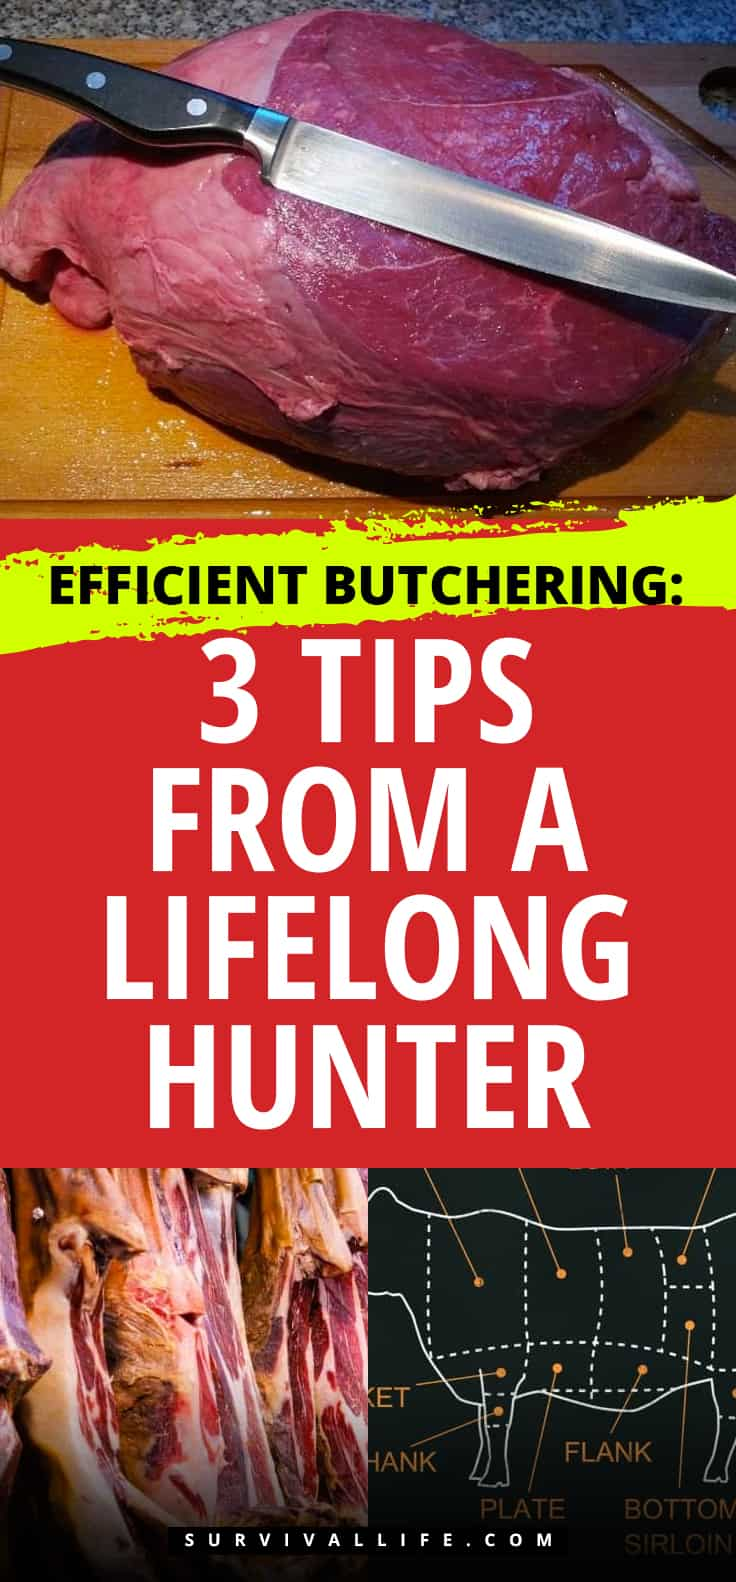 Pinterest Placard   Efficient Butchering: 3 Tips from a Lifelong Hunter   Butchering Tips